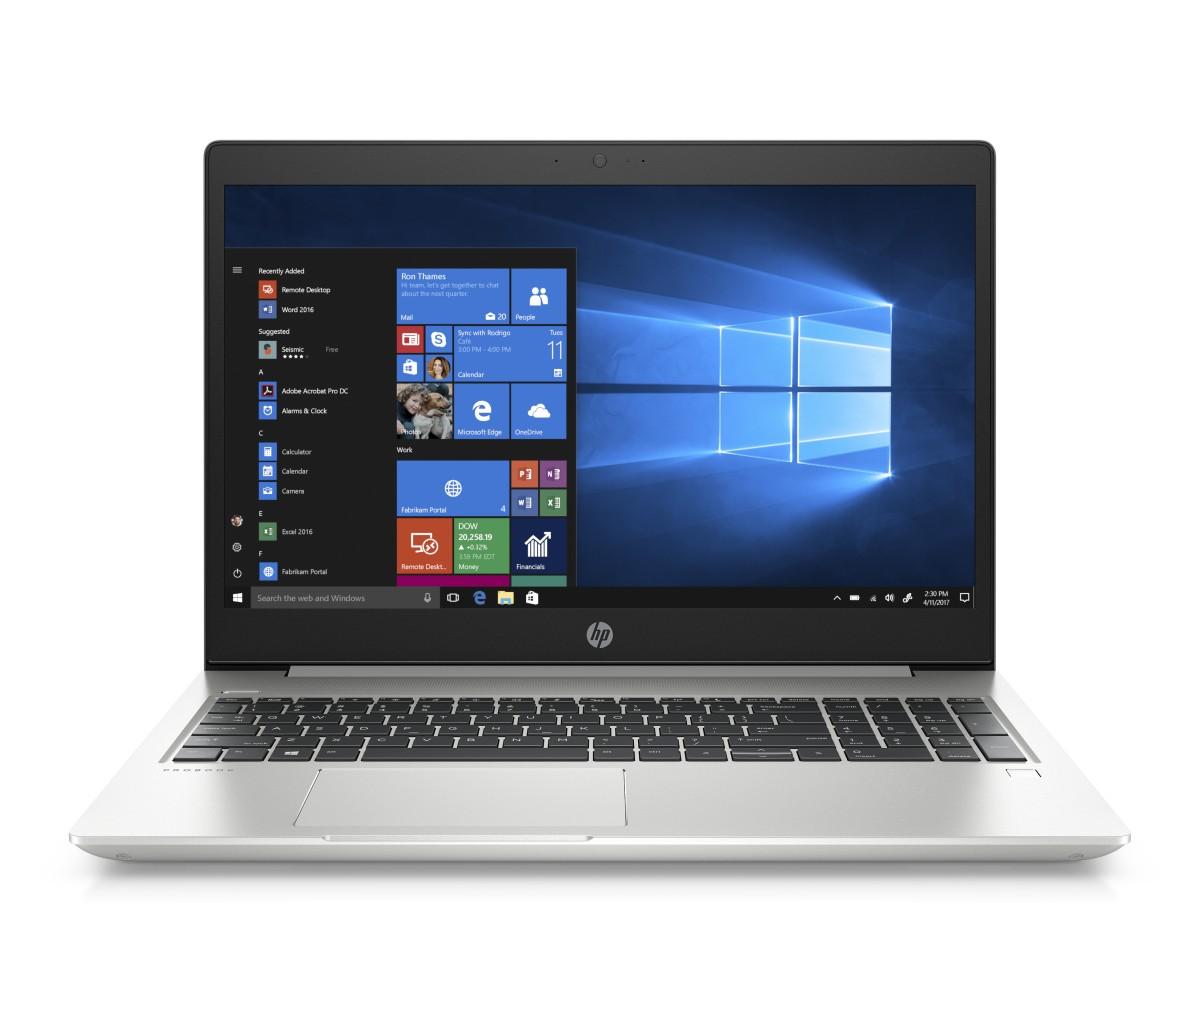 HP ProBook 455 G6 ryz7 Pro-2700U/16GB/512SSD/BT/LAN/Wifi/MCR/FPR/W10P